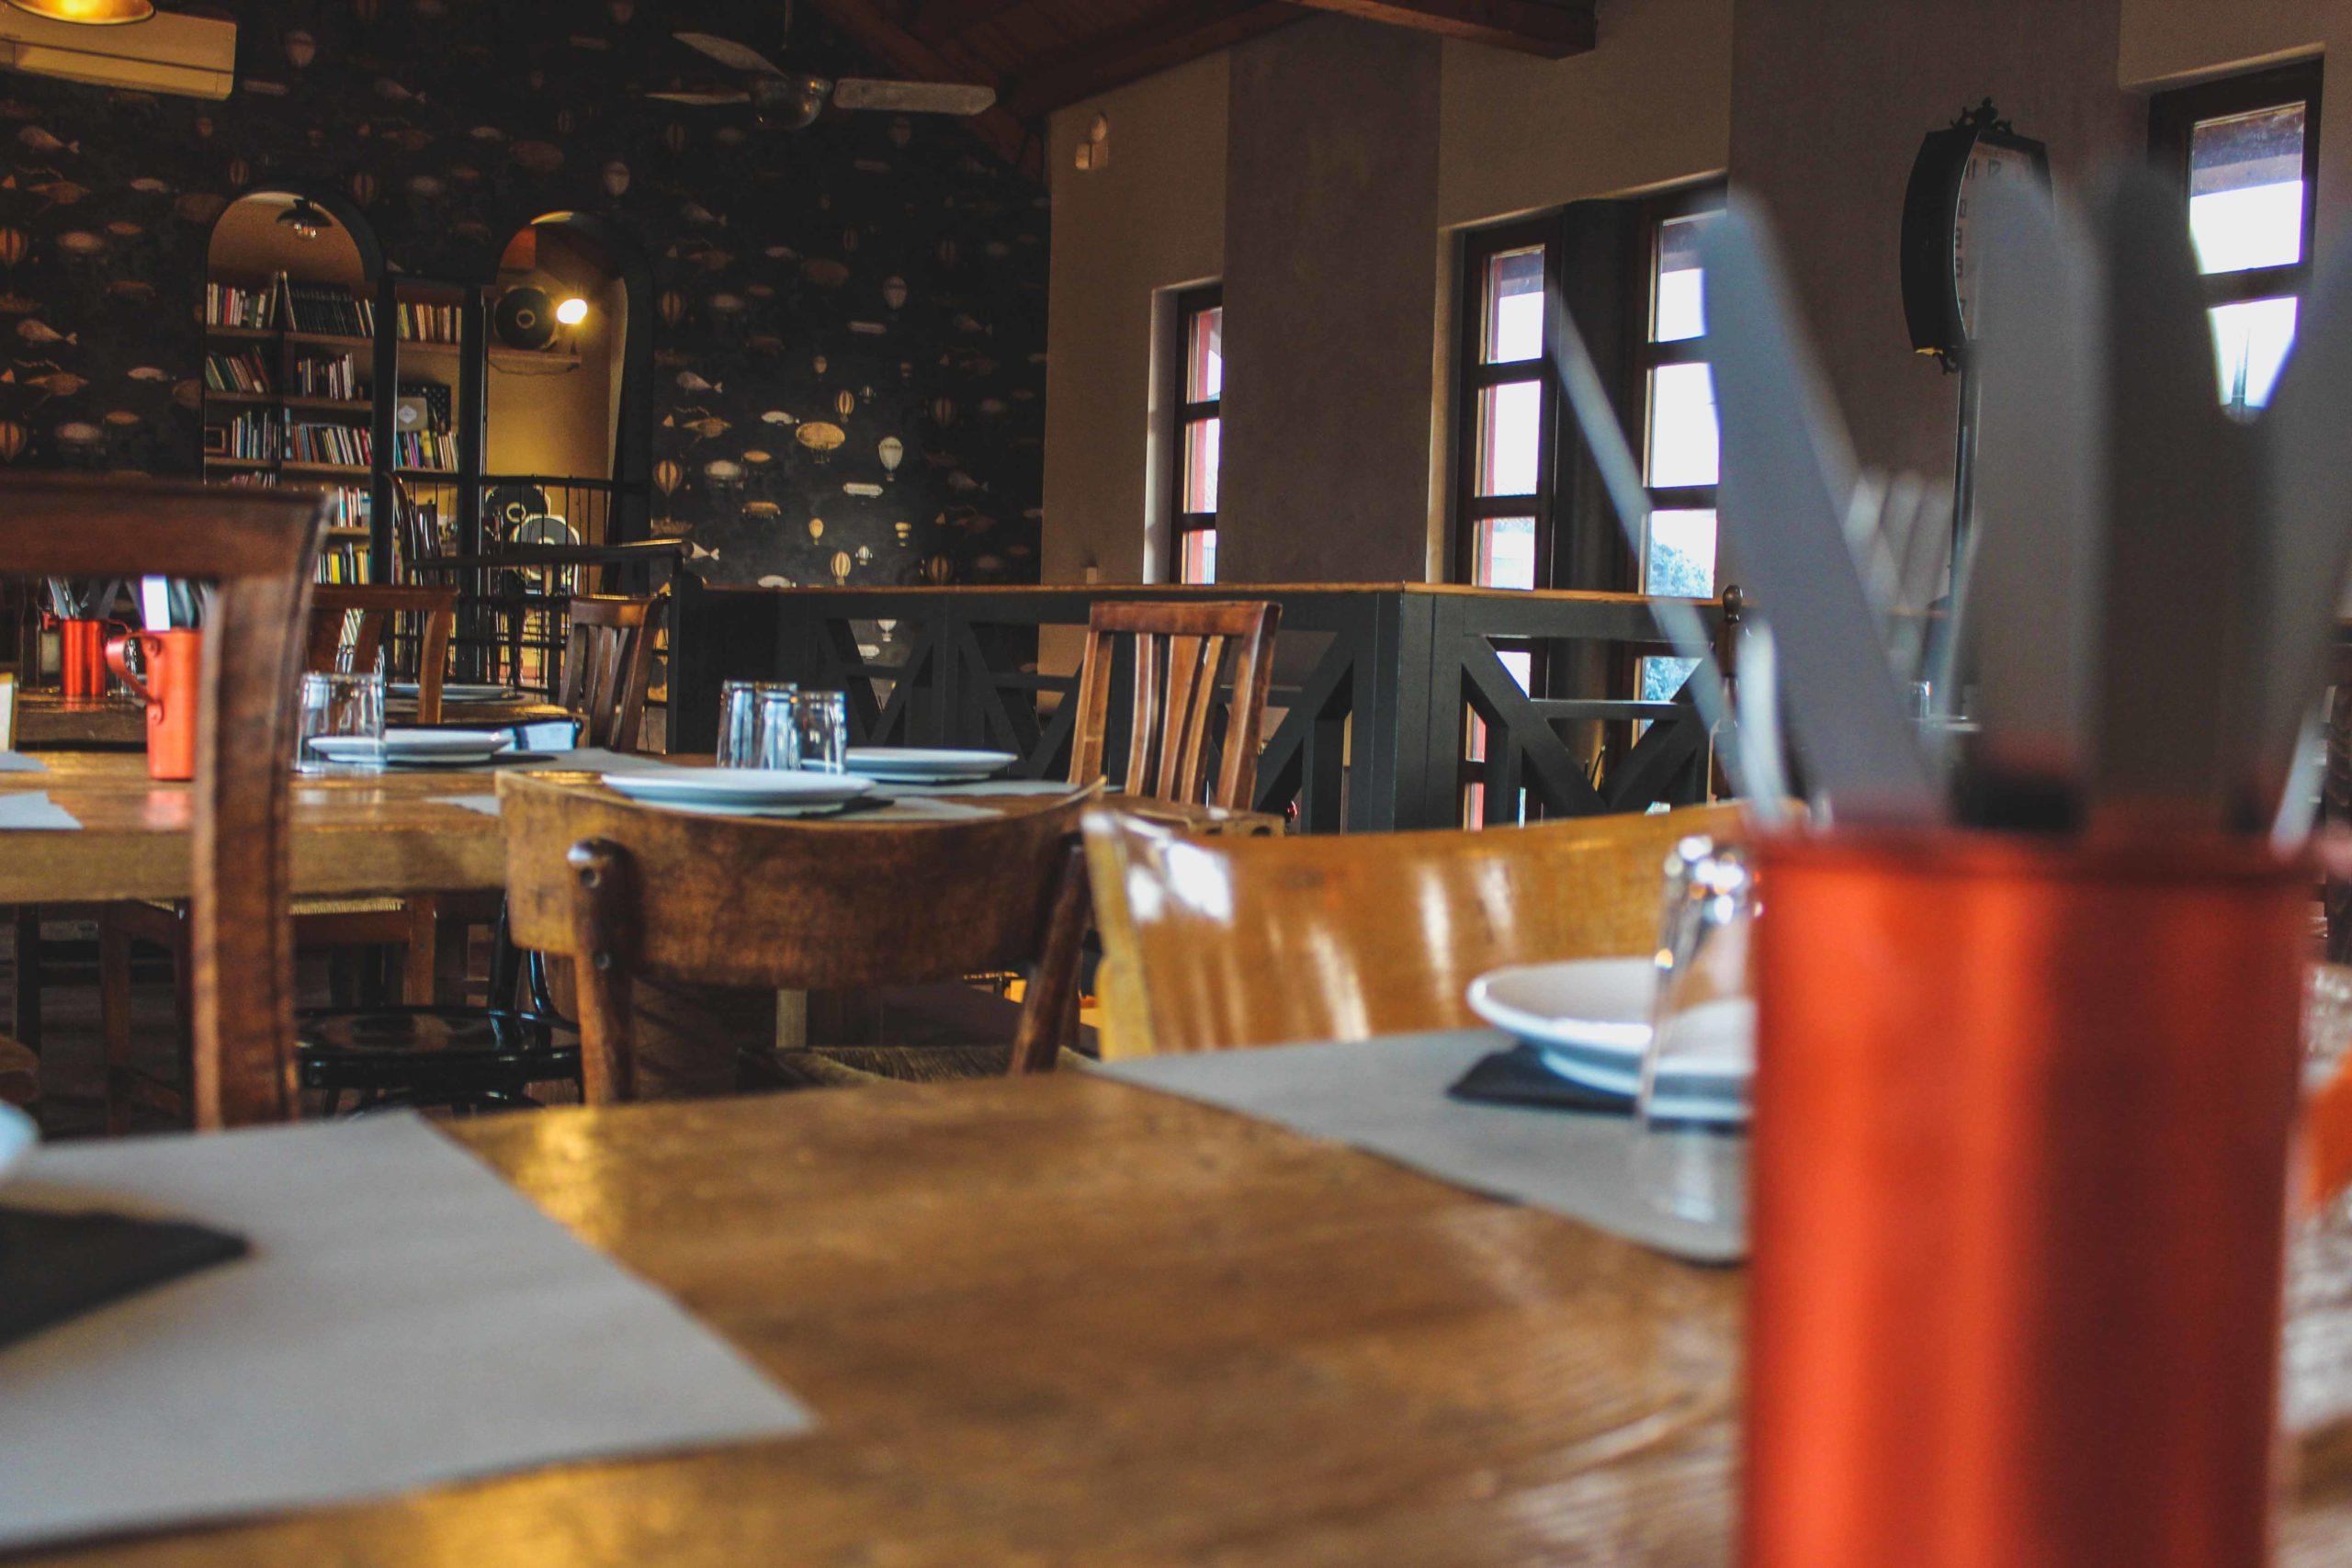 sala ristorante con tavoli preparati